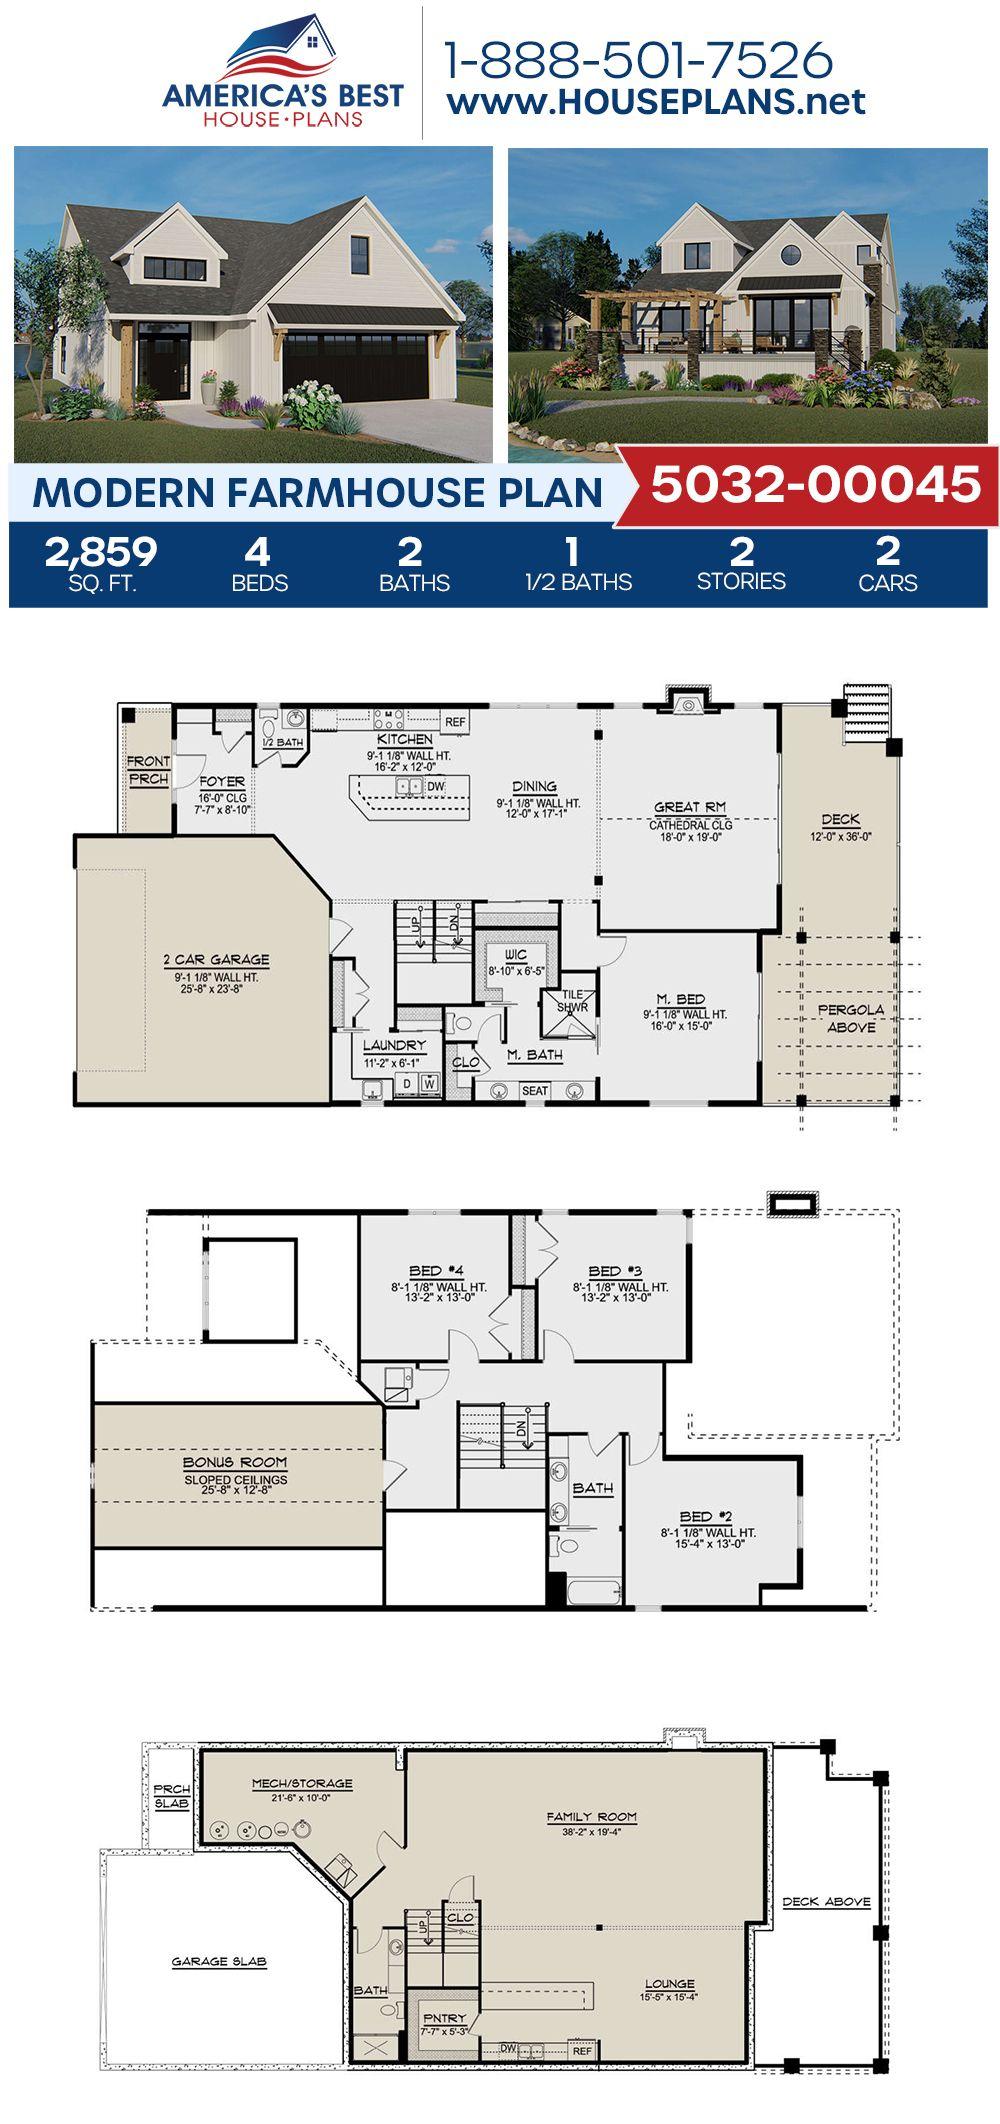 House Plan 5032 00045 Modern Farmhouse Plan 2 859 Square Feet 4 Bedrooms 2 5 Bathrooms Modern Farmhouse Plans Farmhouse Plans House Plans Farmhouse